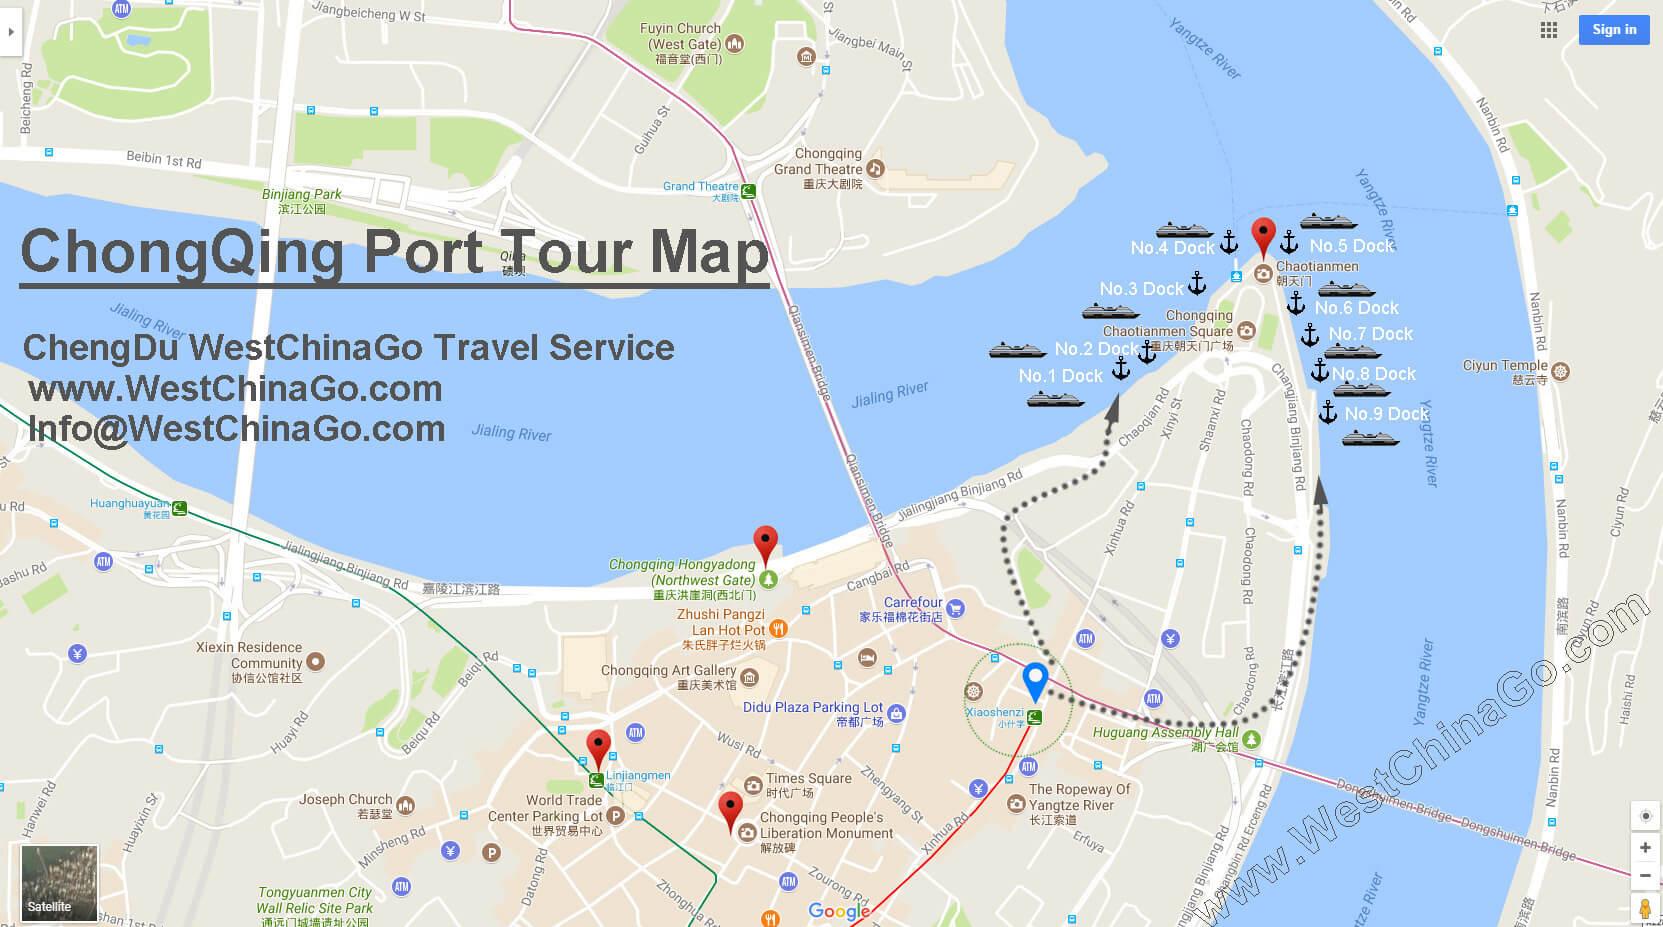 How To Get to ChongQing ChaoTianMen Port